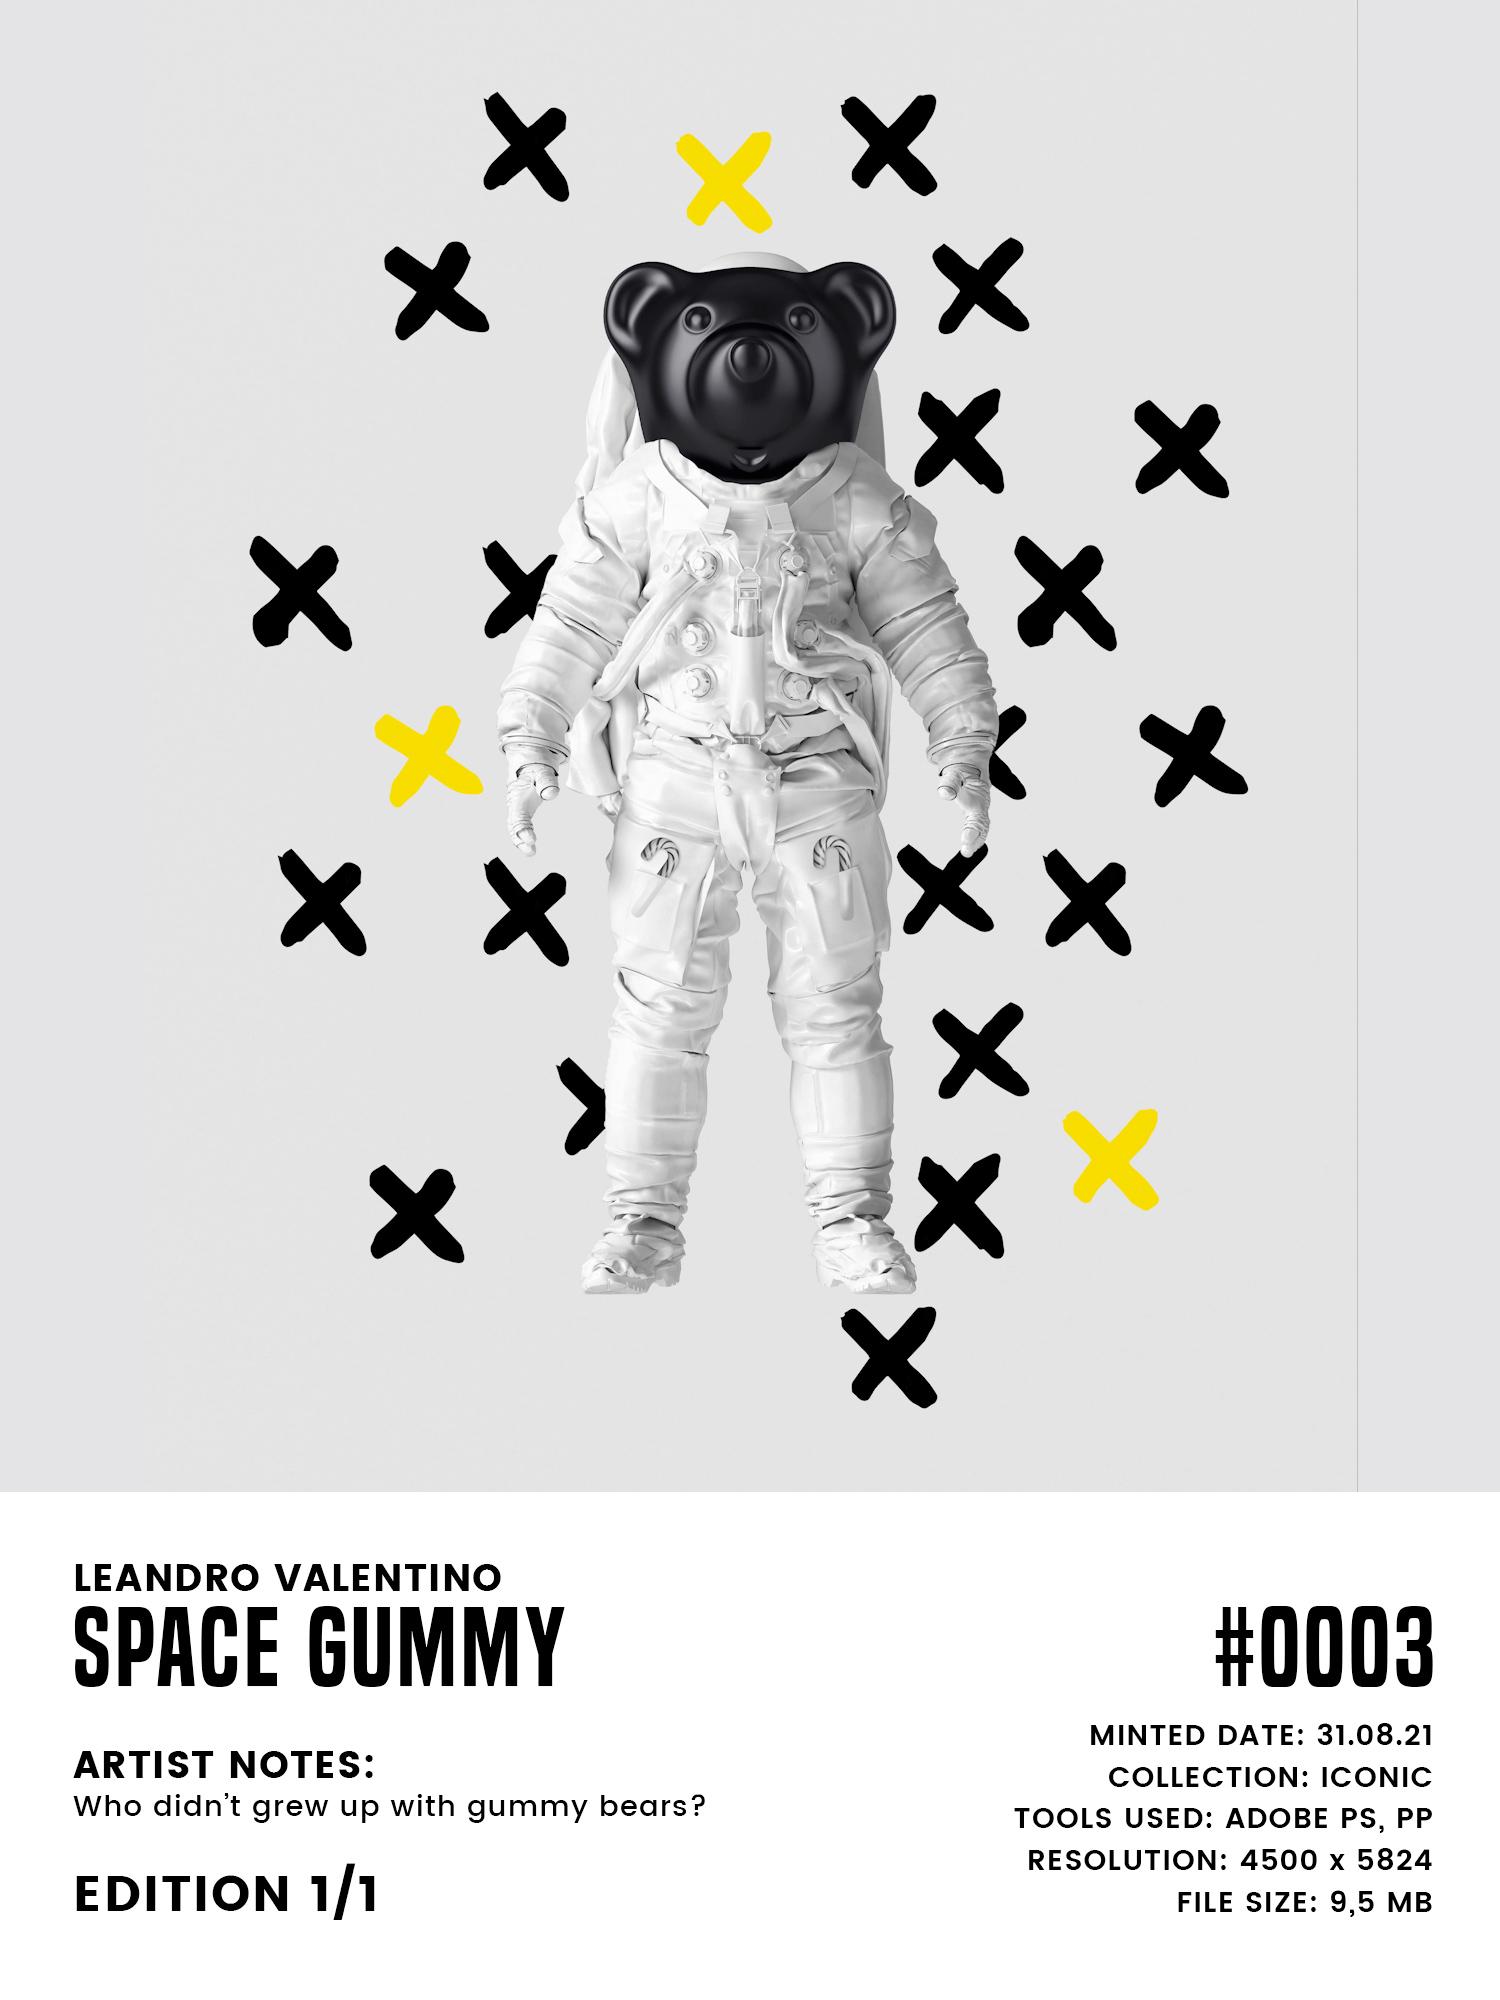 Space Gummy